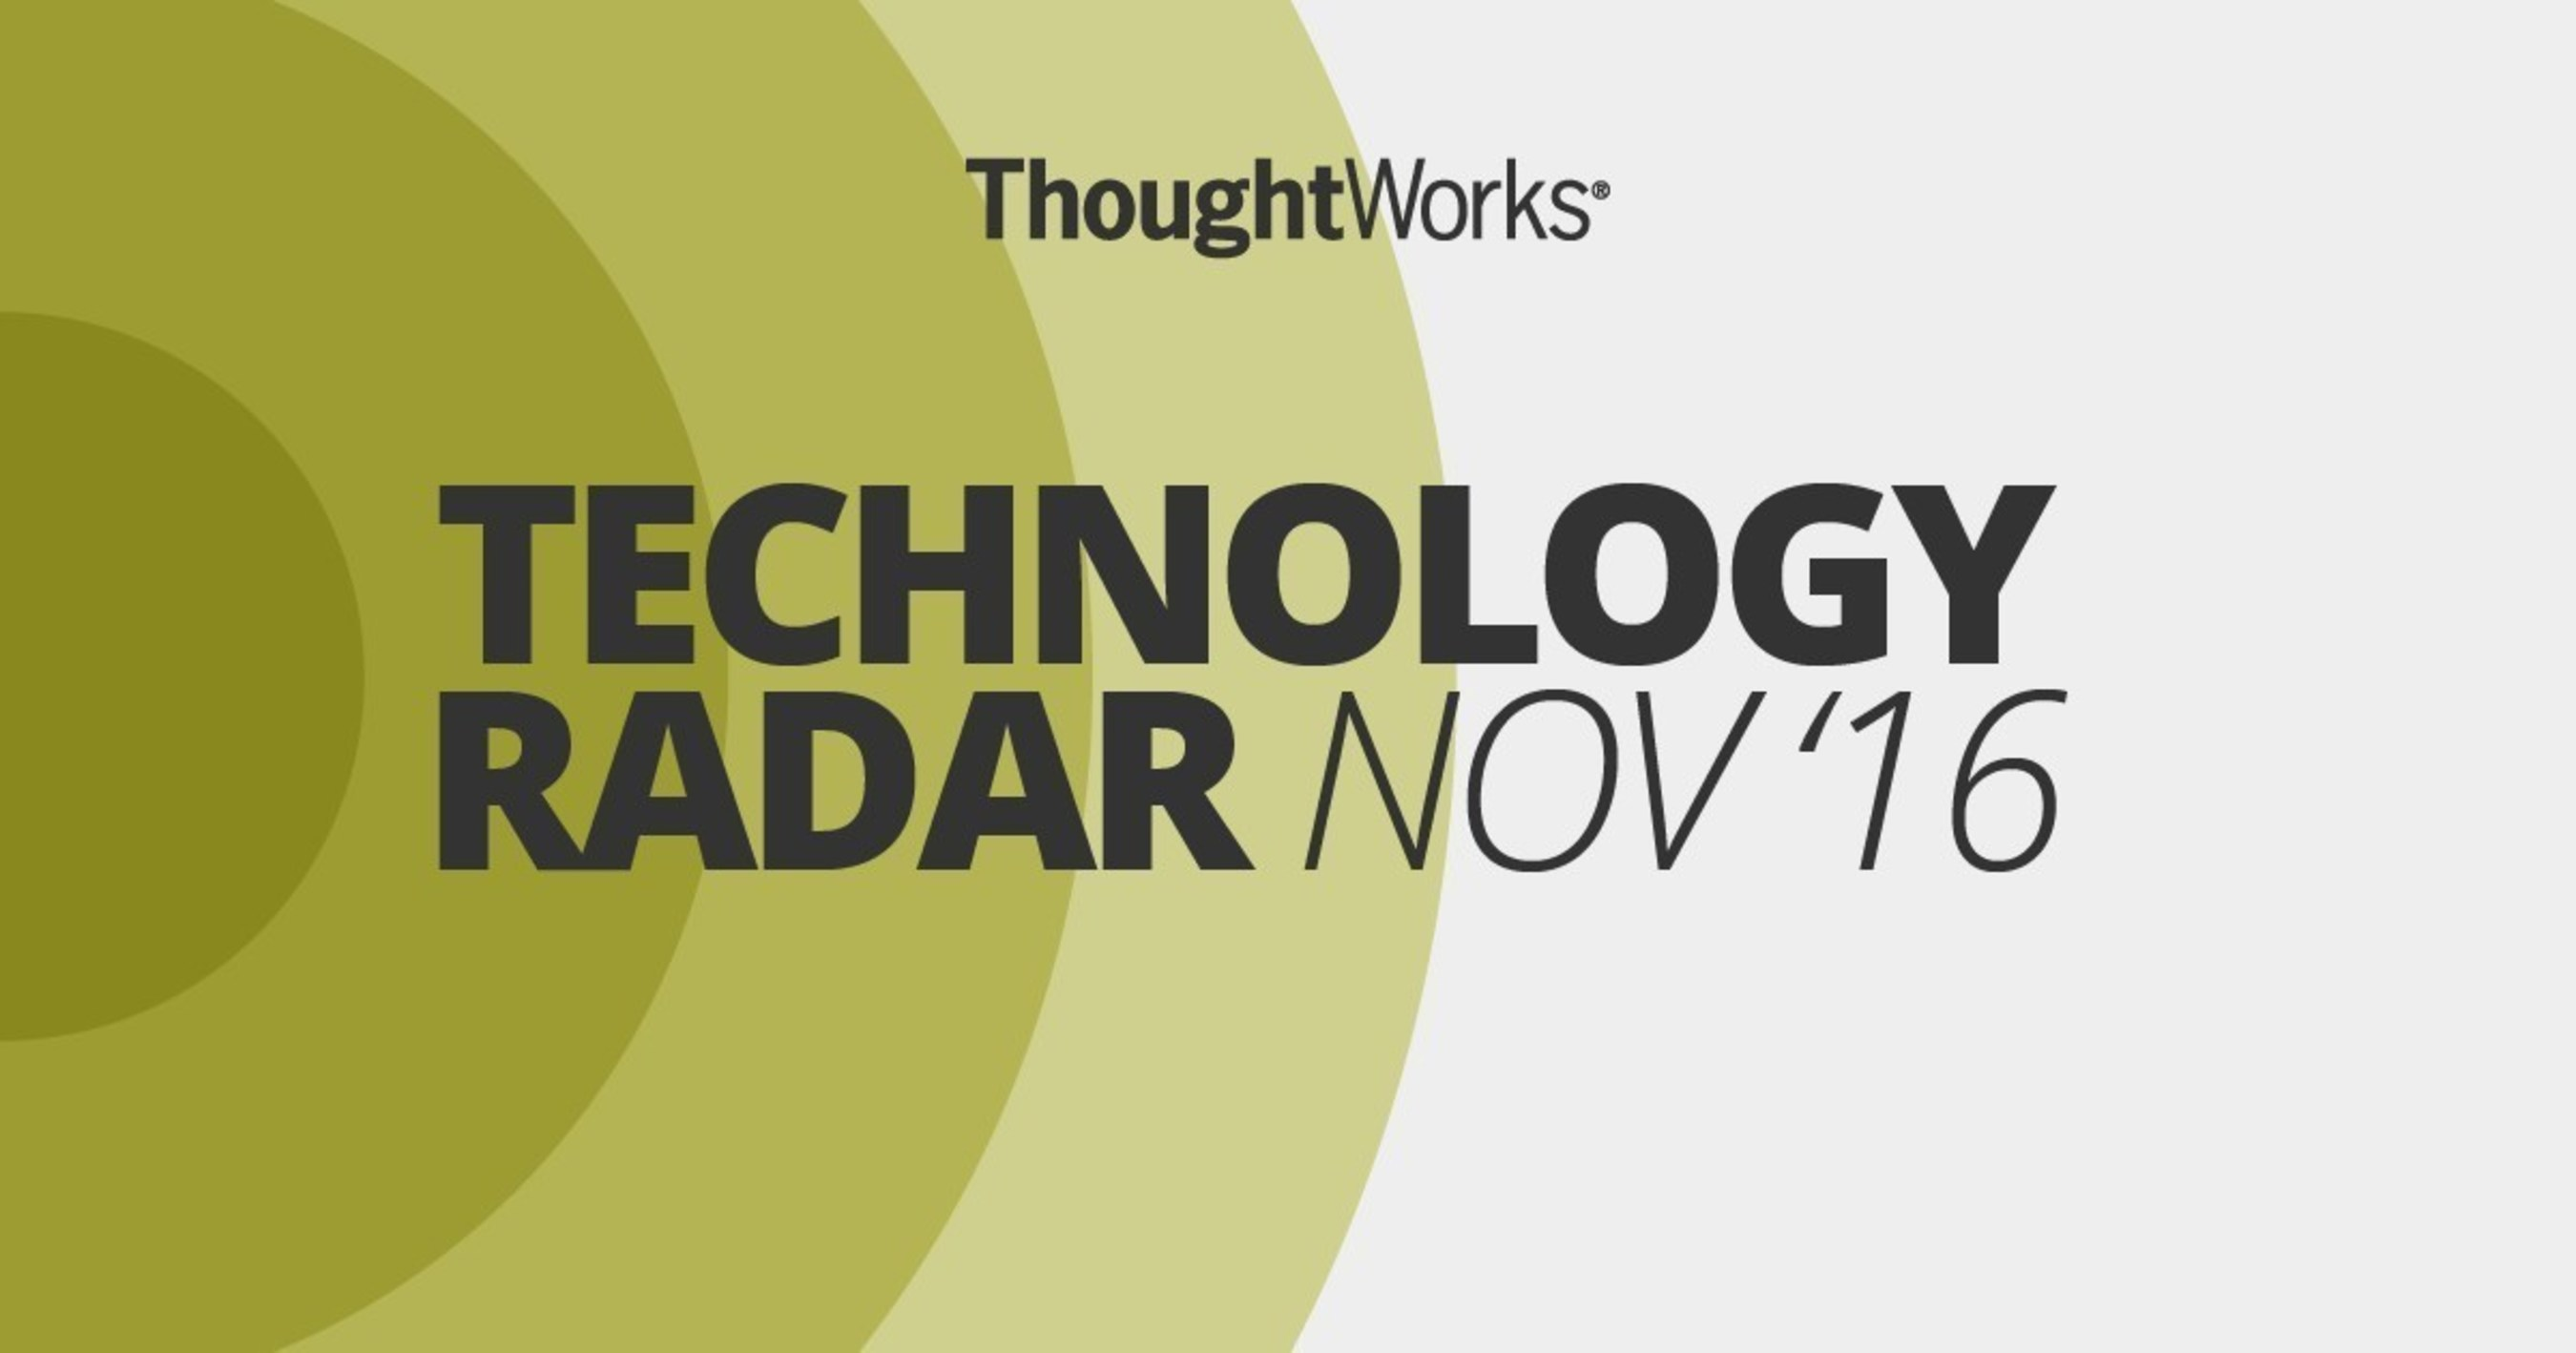 ThoughtWorks' Bi-Annual Technology Radar Highlights Emerging